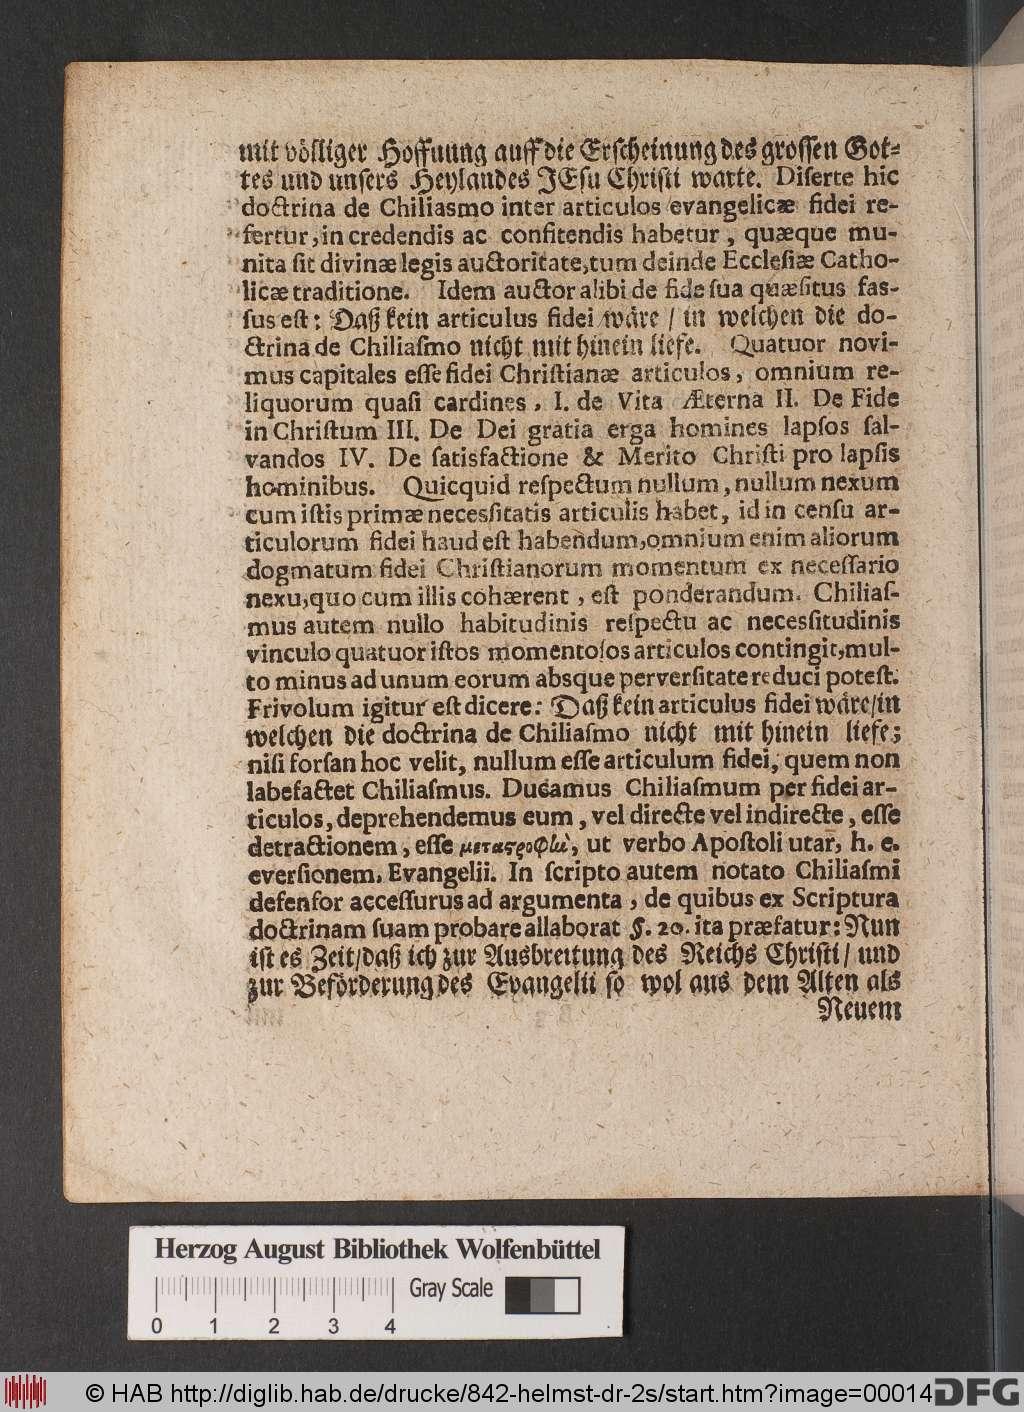 https://diglib.hab.de/drucke/842-helmst-dr-2s/00014.jpg